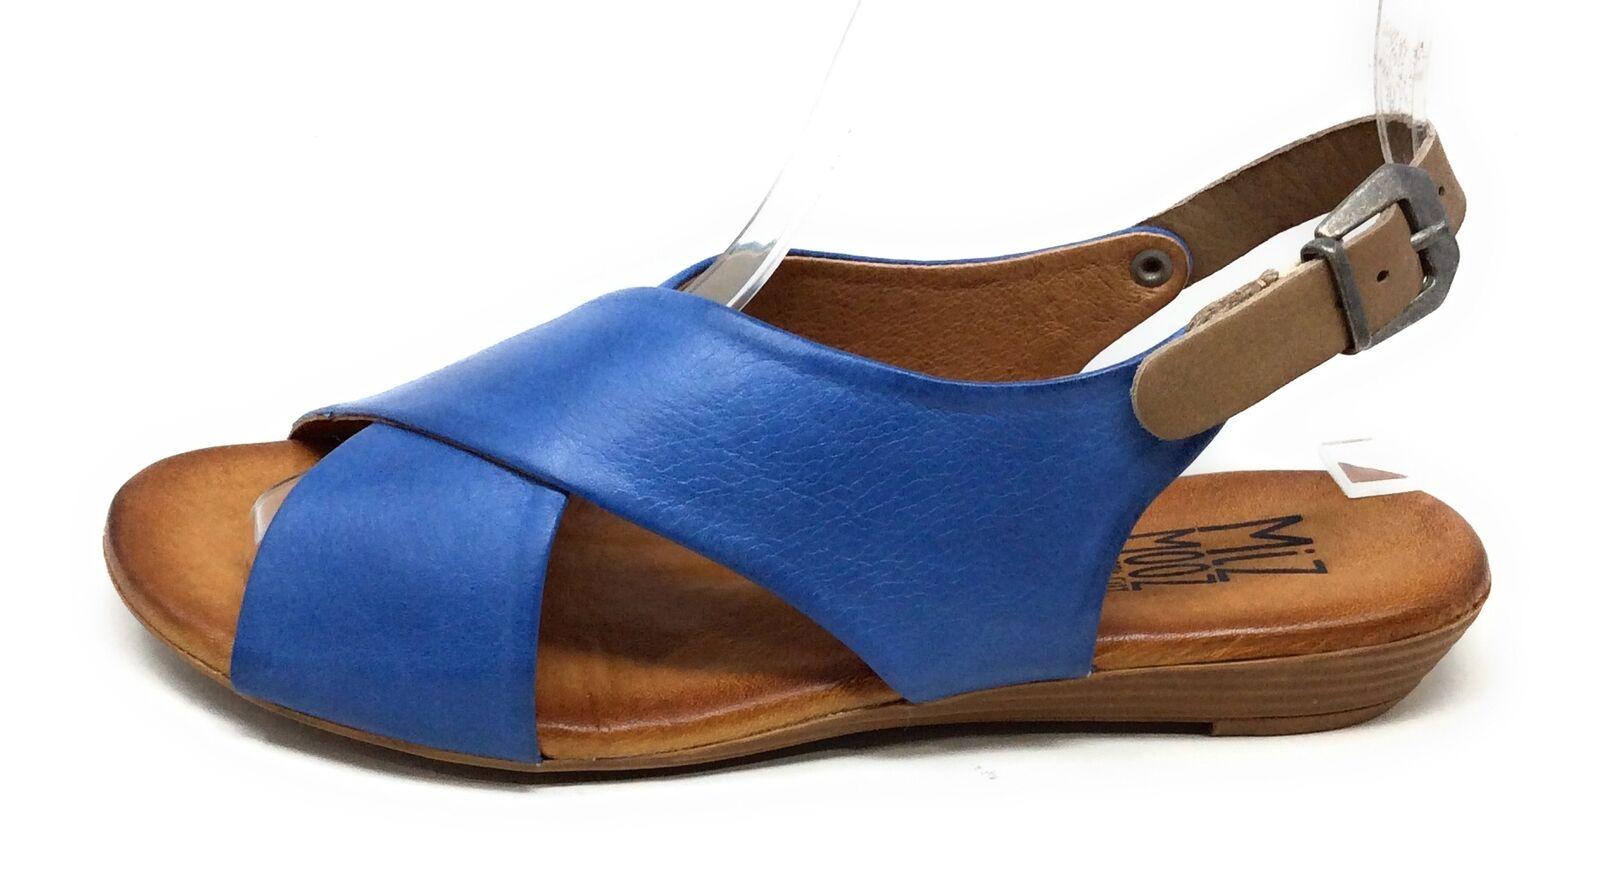 Miz Mooz Damen Anya Kreuz Riemchensandale Leder Jeans Blau 37 Eu 6.5-7 US